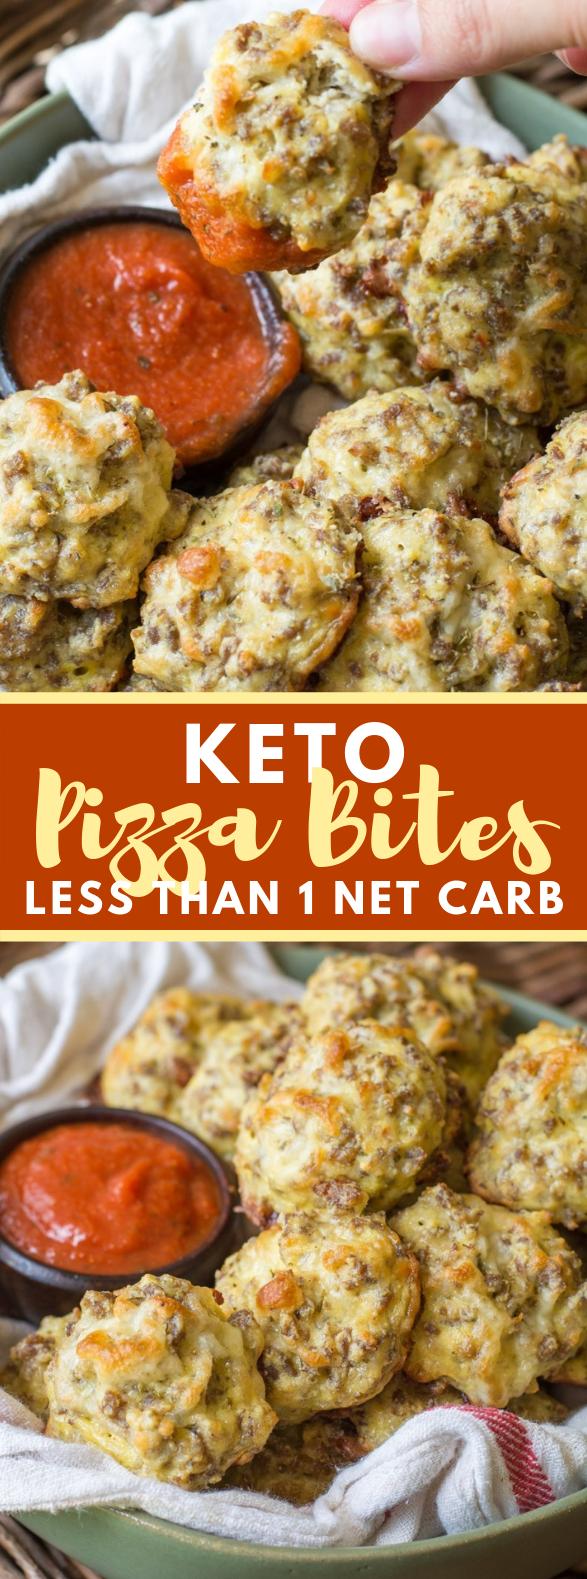 Easy Keto Pizza Bites #healthy #ketodiet